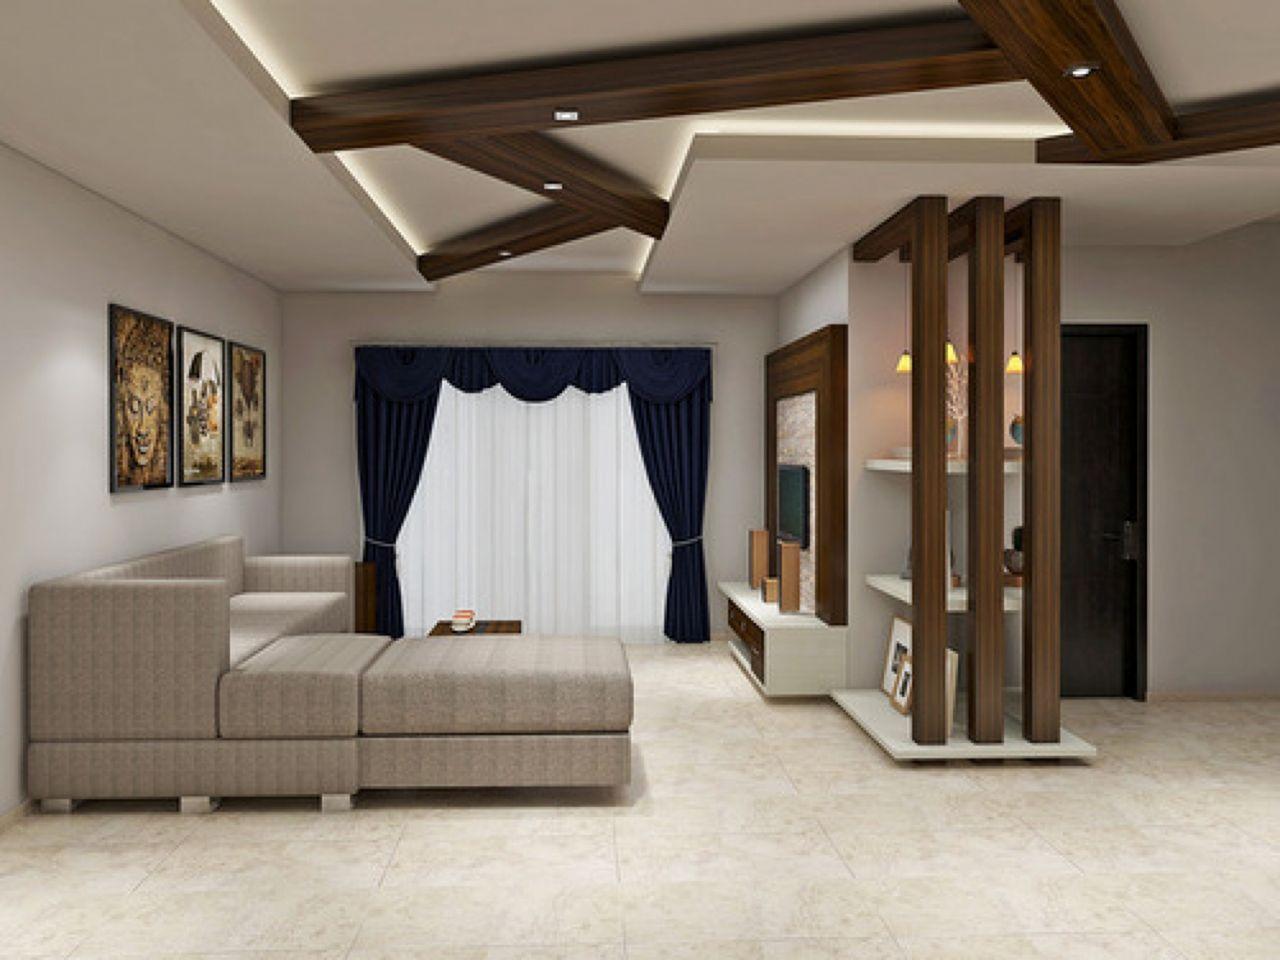 Simple Ceiling Ideas 2 Bosidolot Zimmerdecke Verkleiden Simple Ceiling Ideas 2 Zimmerdecke Verkleiden Huisarchitectuur Interieur Design Blogs #simple #ceiling #design #living #room